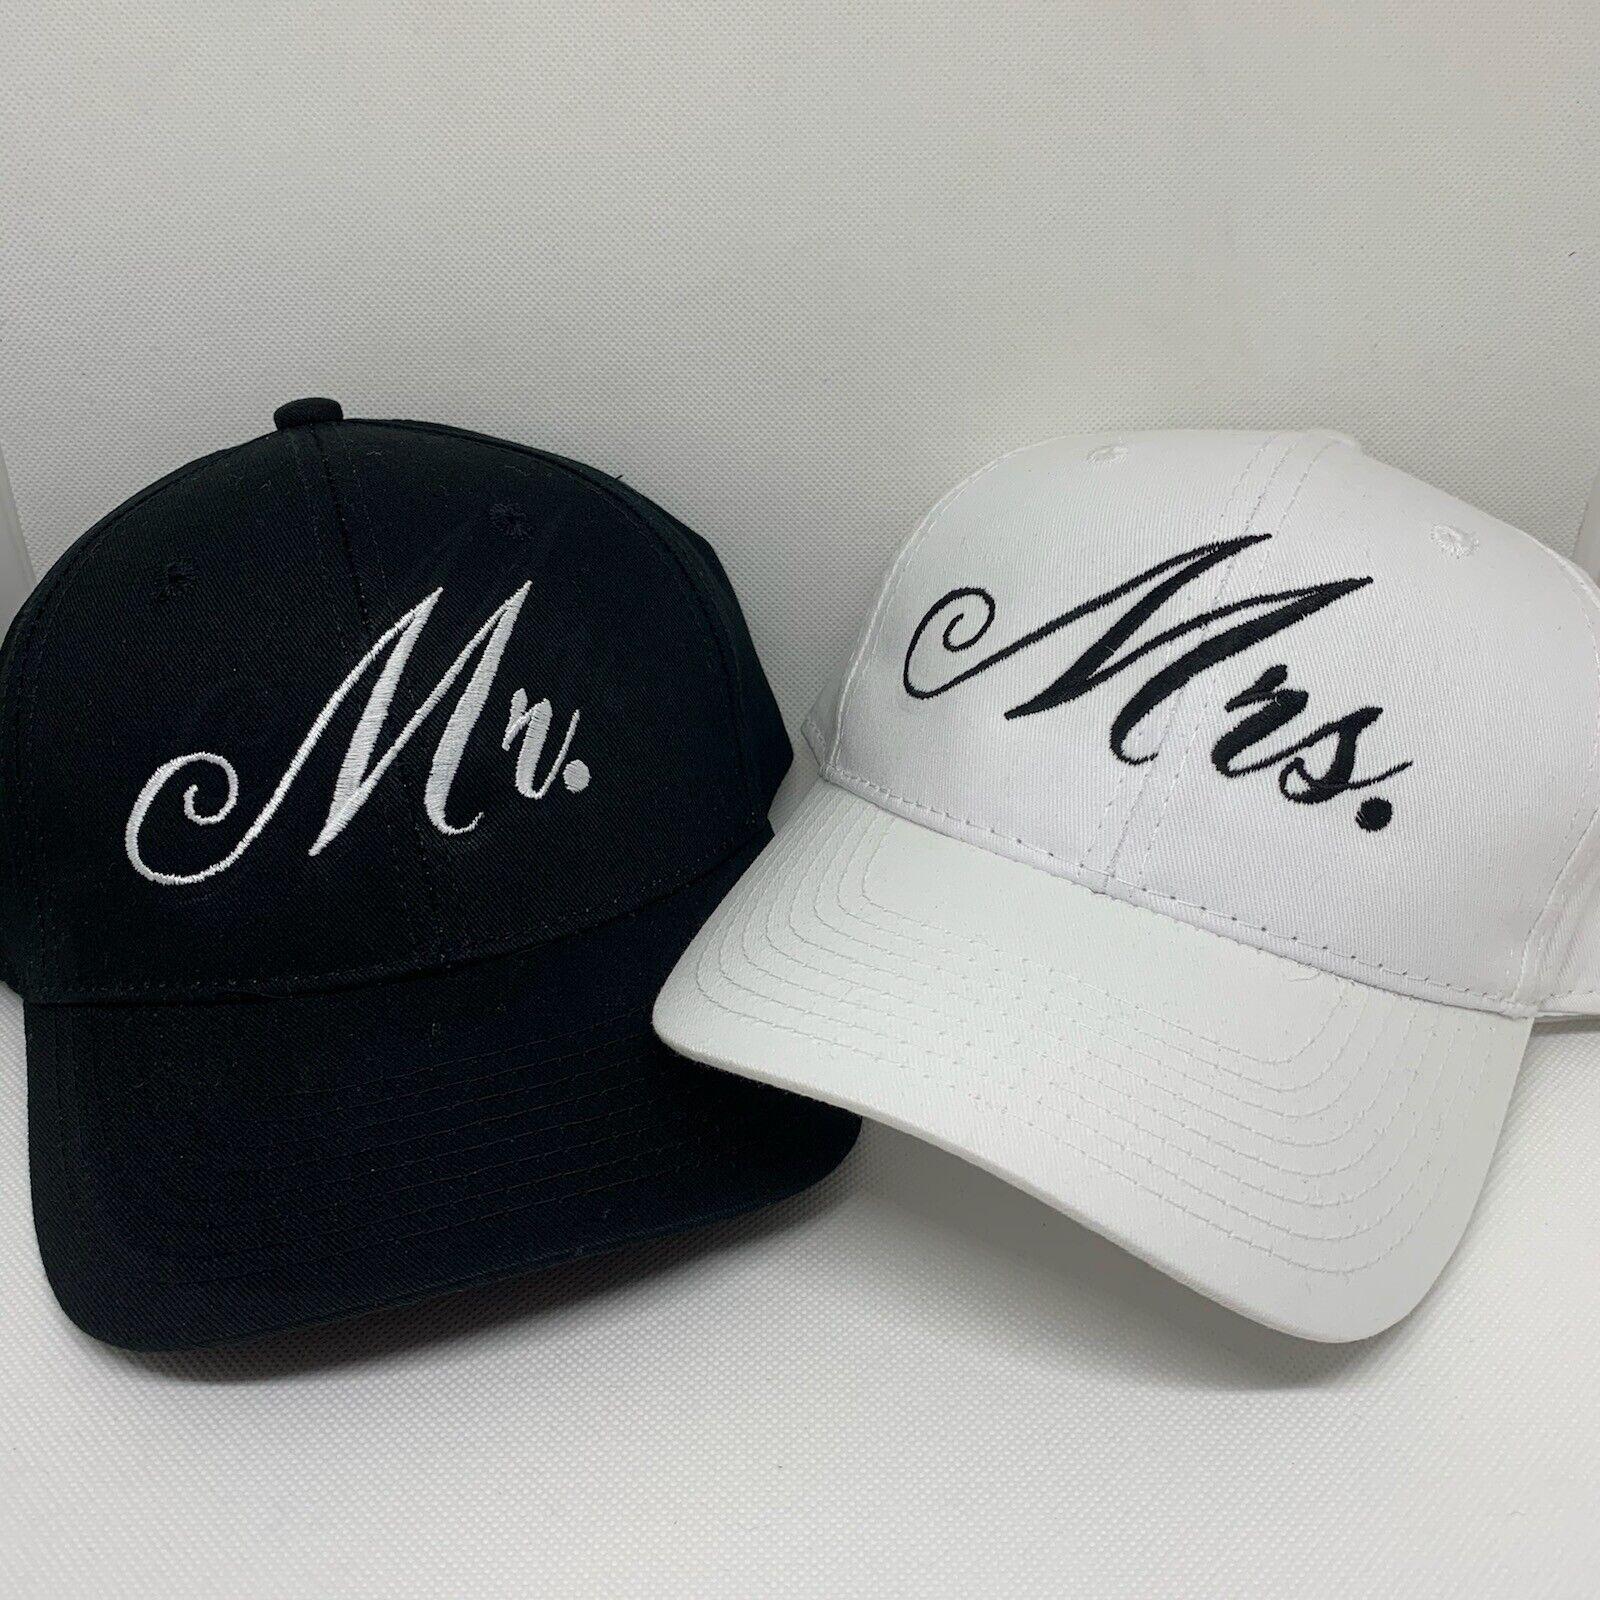 Mr. and Mrs. SET Embroidered Hats Bridal Shower gift Bride Groom hats